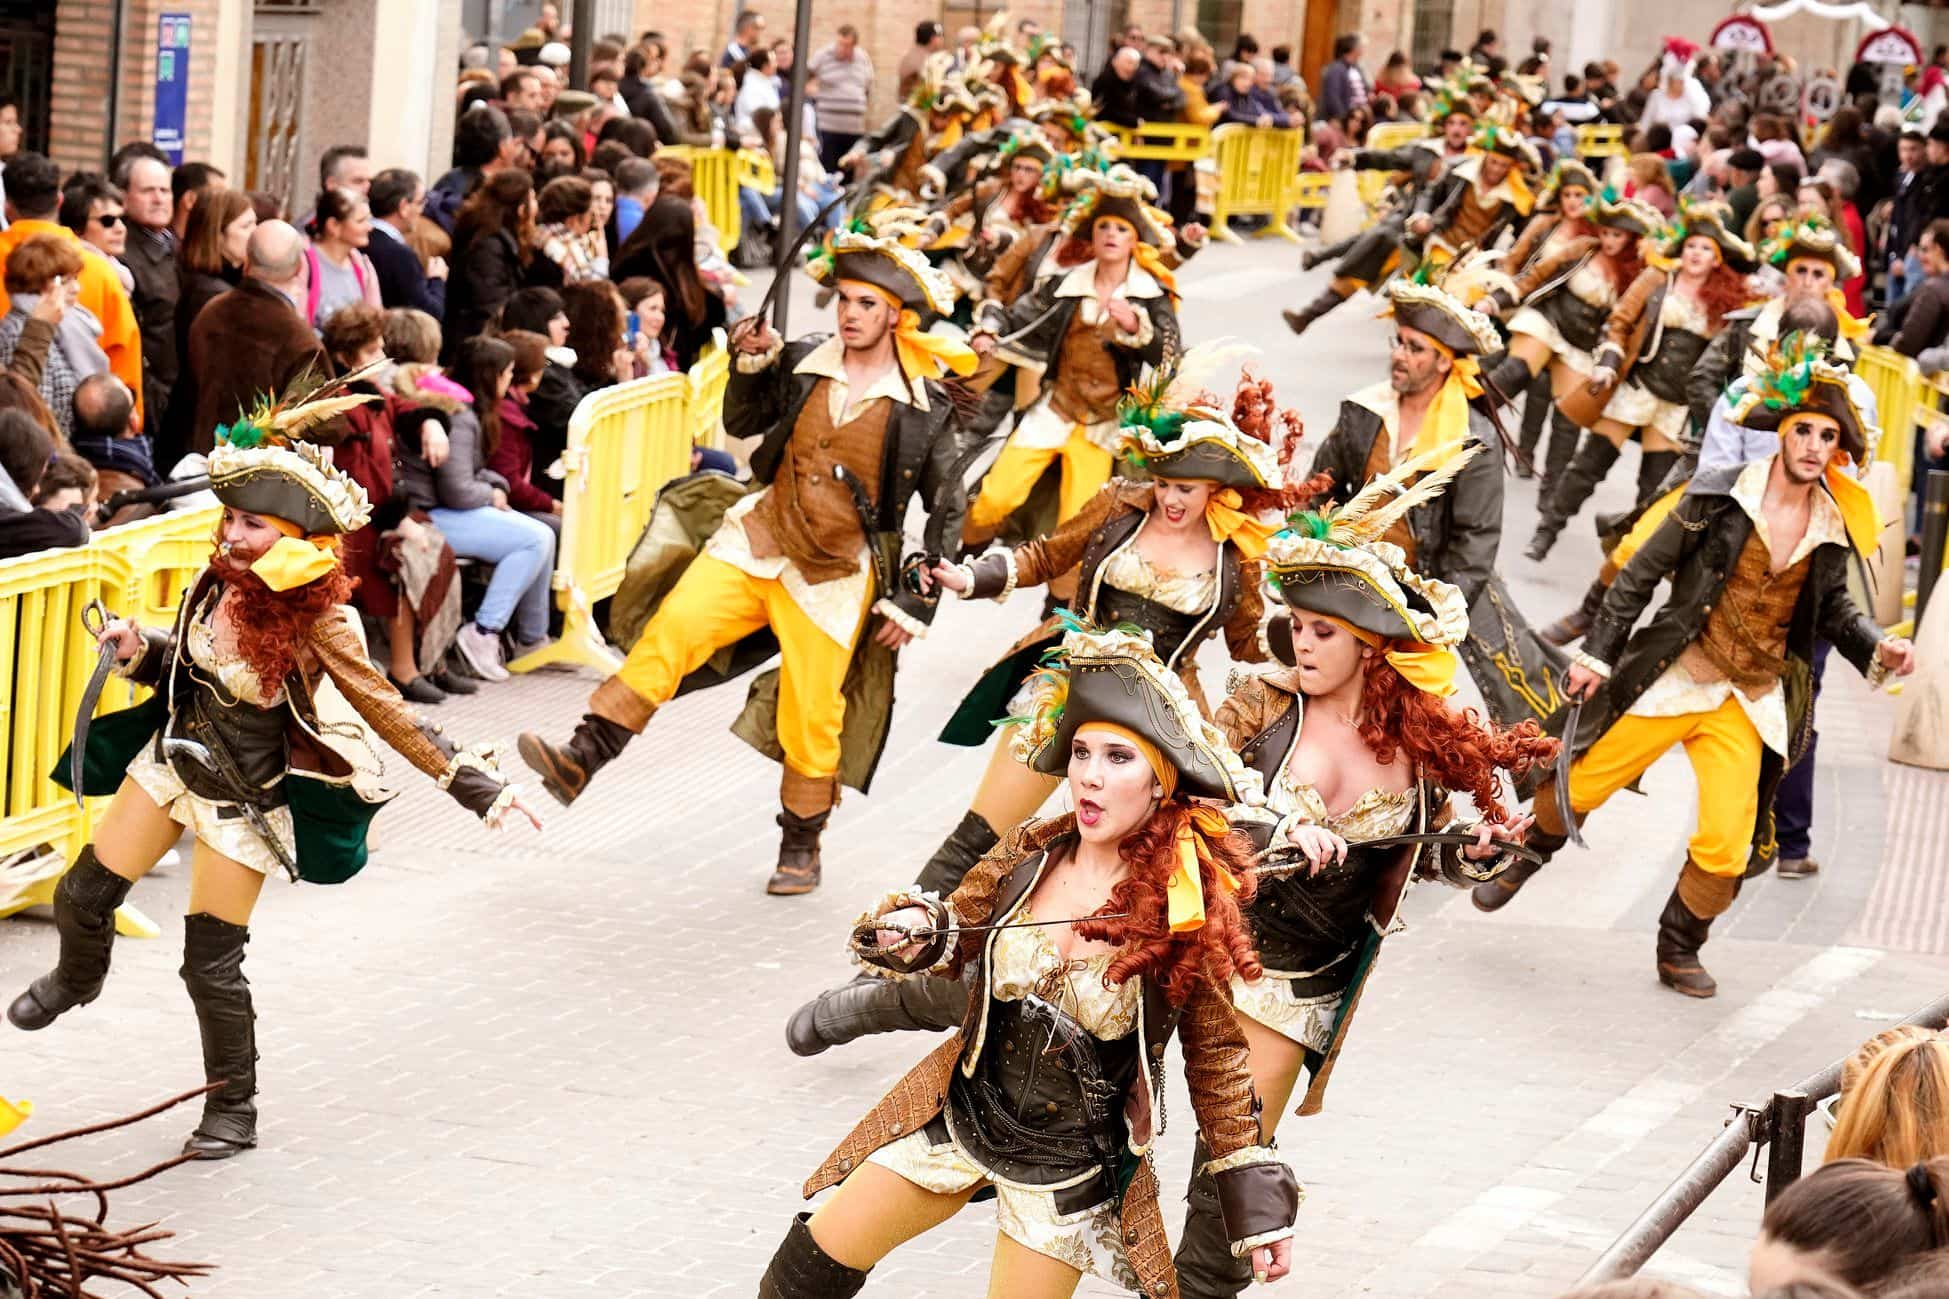 Carnaval de herencia 2020 ofertorio 44 - Selección de fotografías del Ofertorio del Carnaval de Herencia